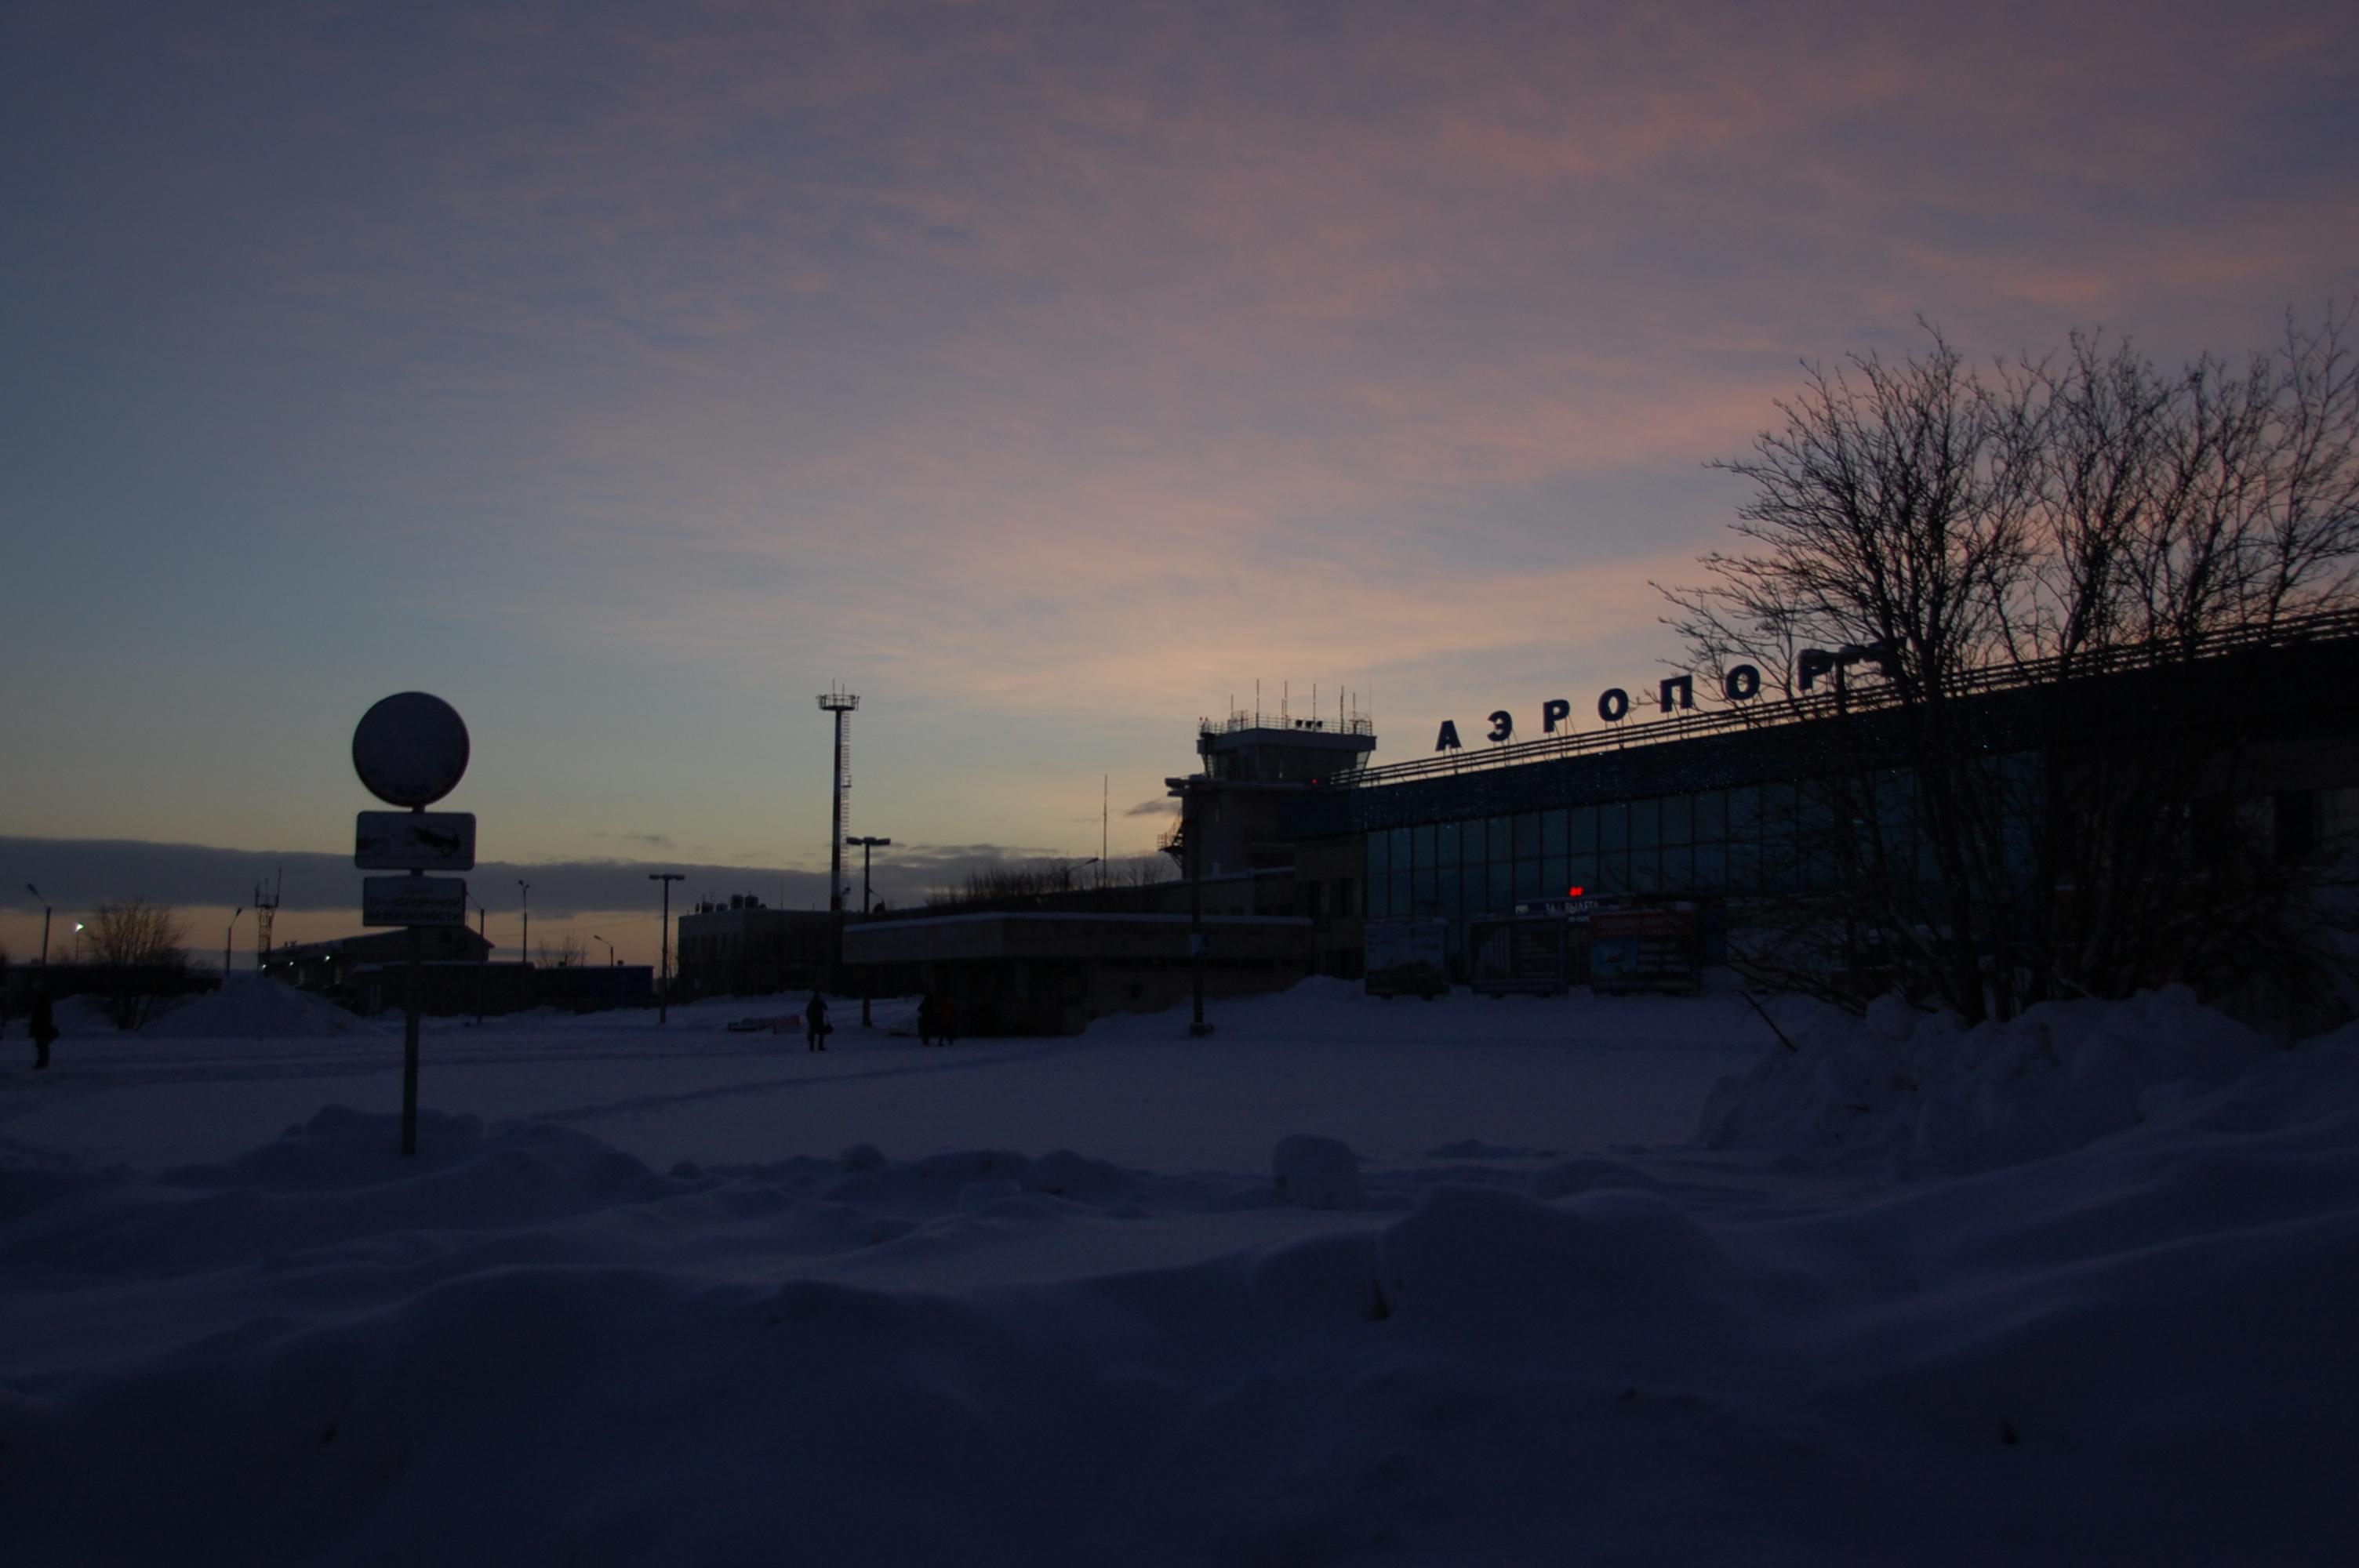 Murmansk airport. / Source: Maria Stambler